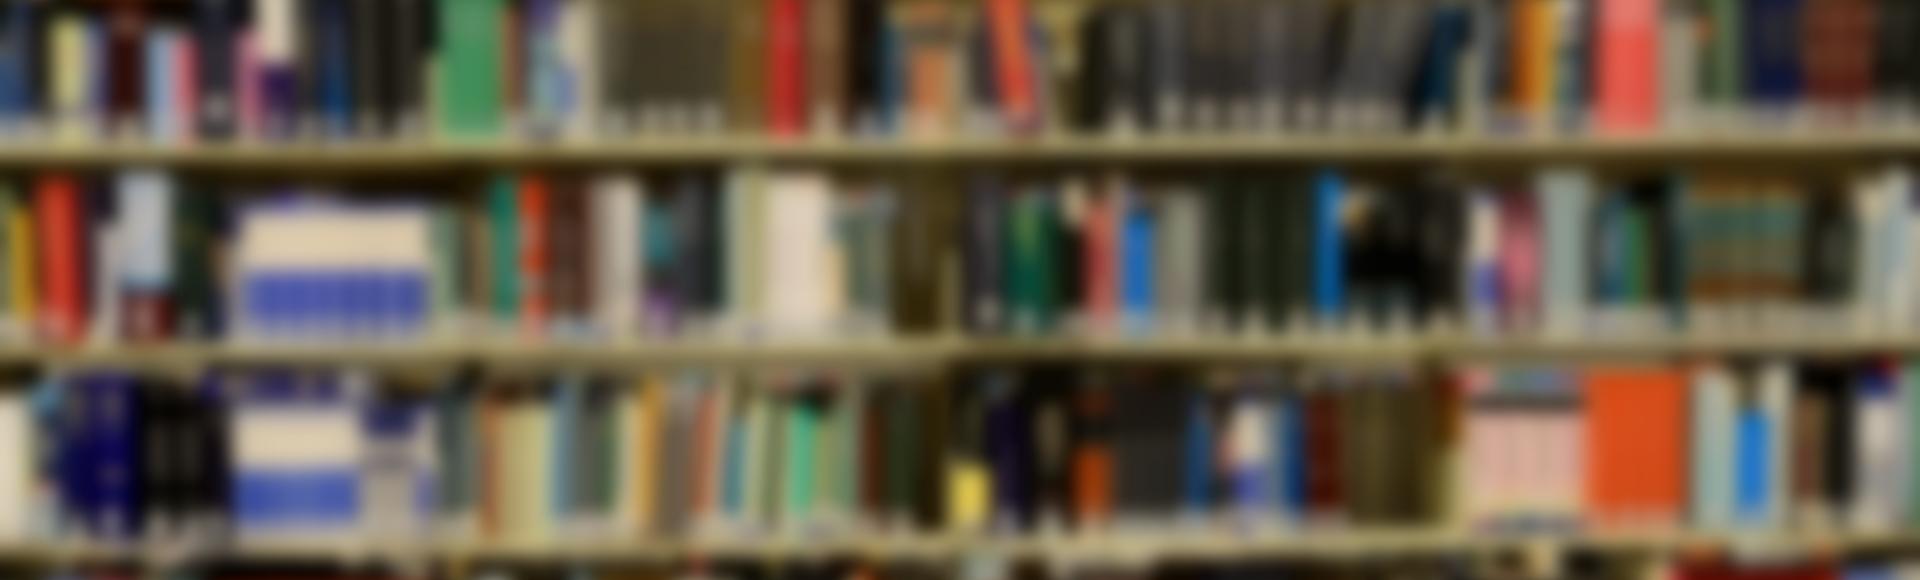 Vers la bibliothèque 4ème lieu